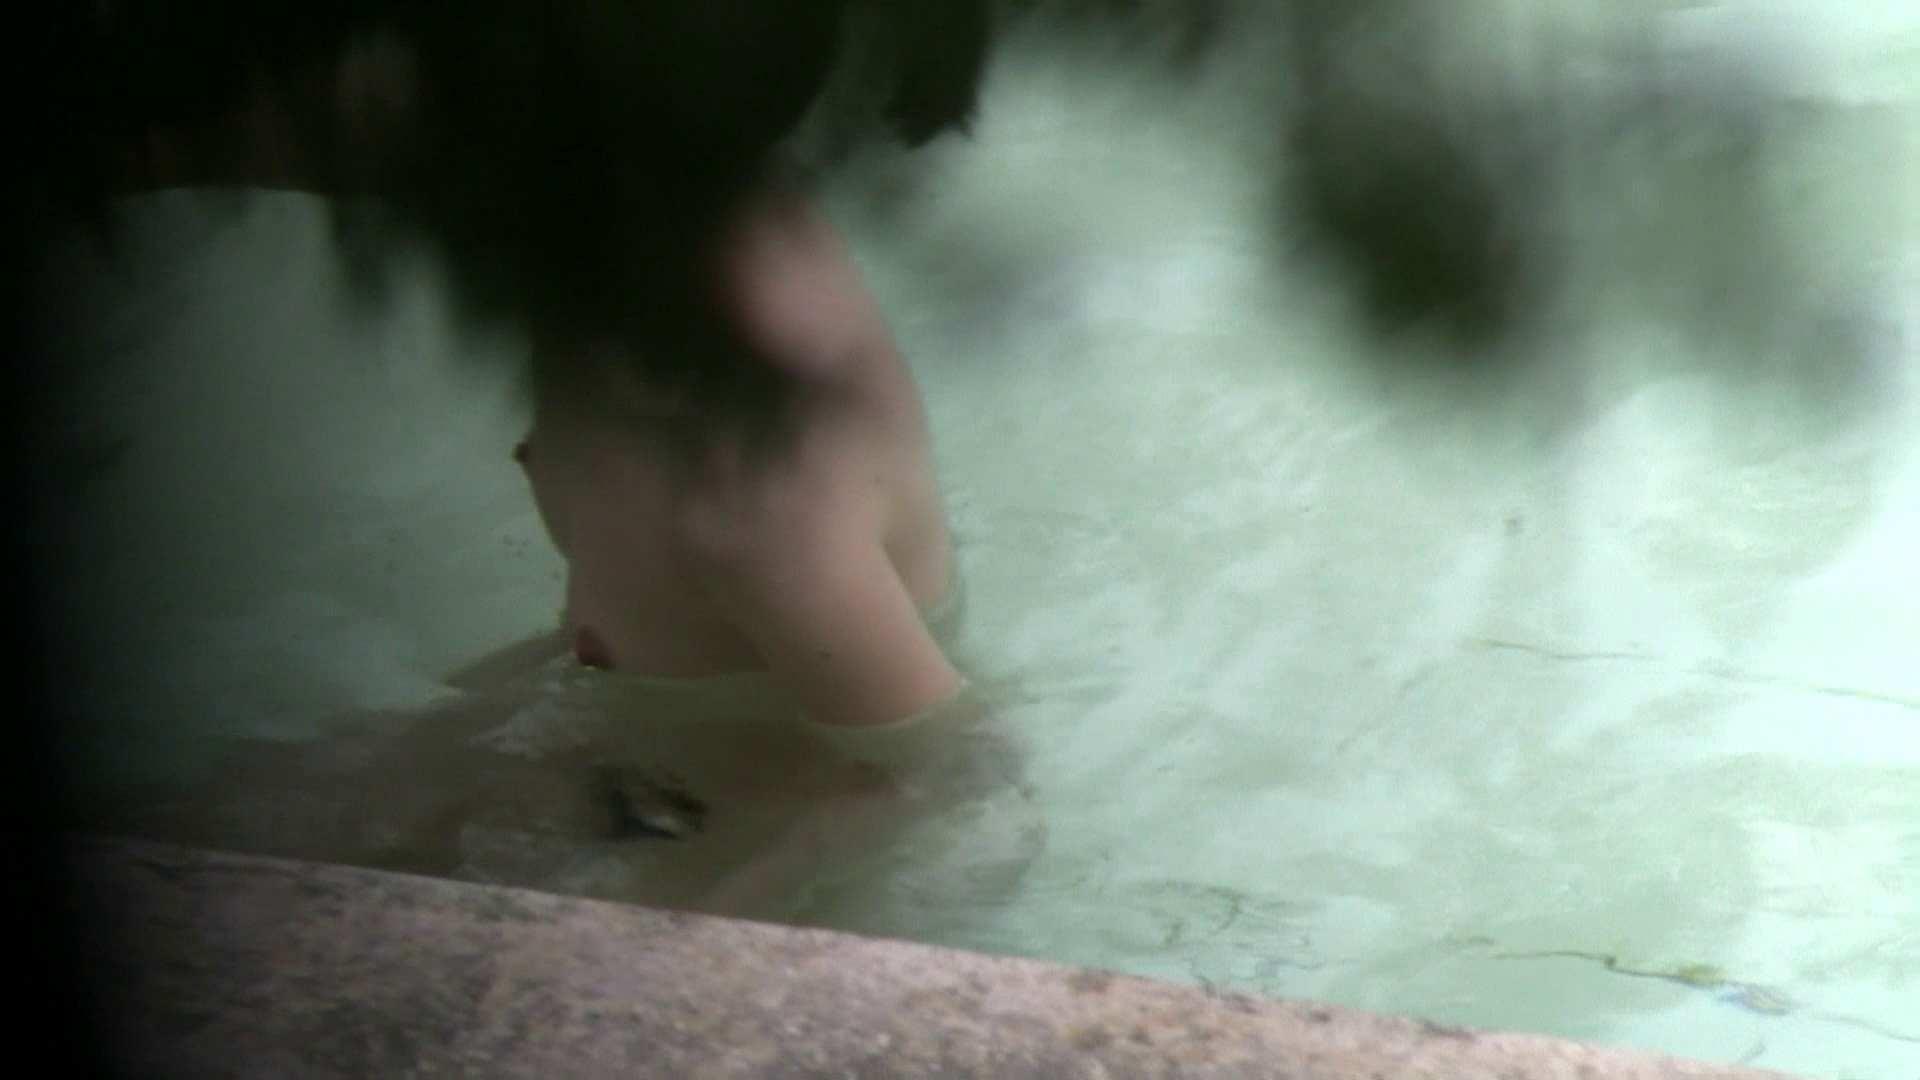 Aquaな露天風呂Vol.656 盗撮 AV無料 72画像 56